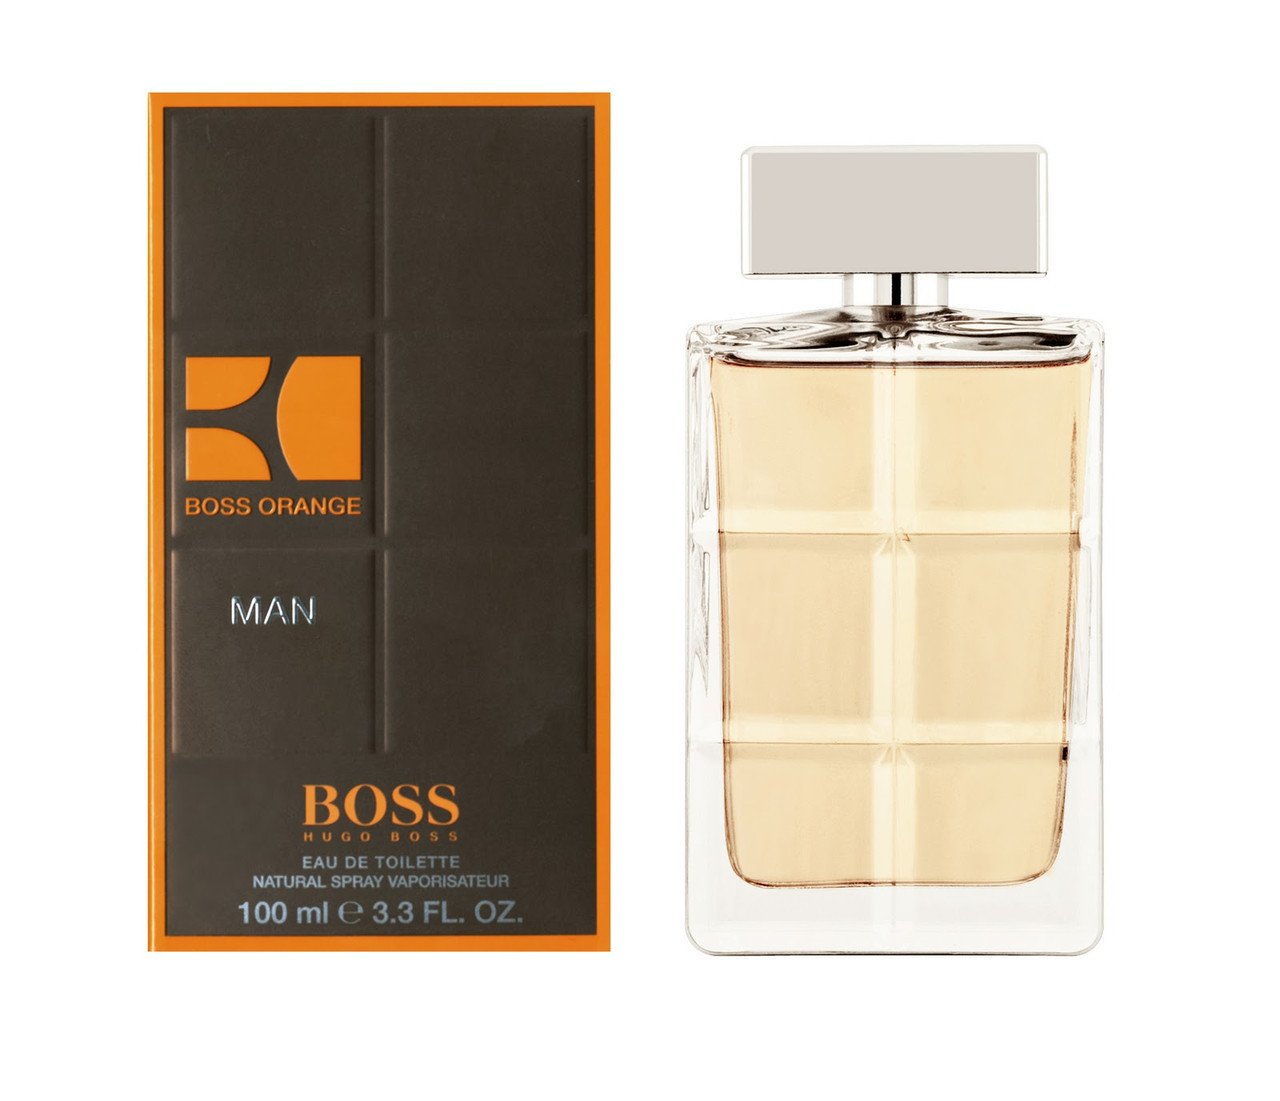 Уценка Hugo Boss Boss Orange Men EDT 100 ml (лиц.)-брак крпуса, 90%